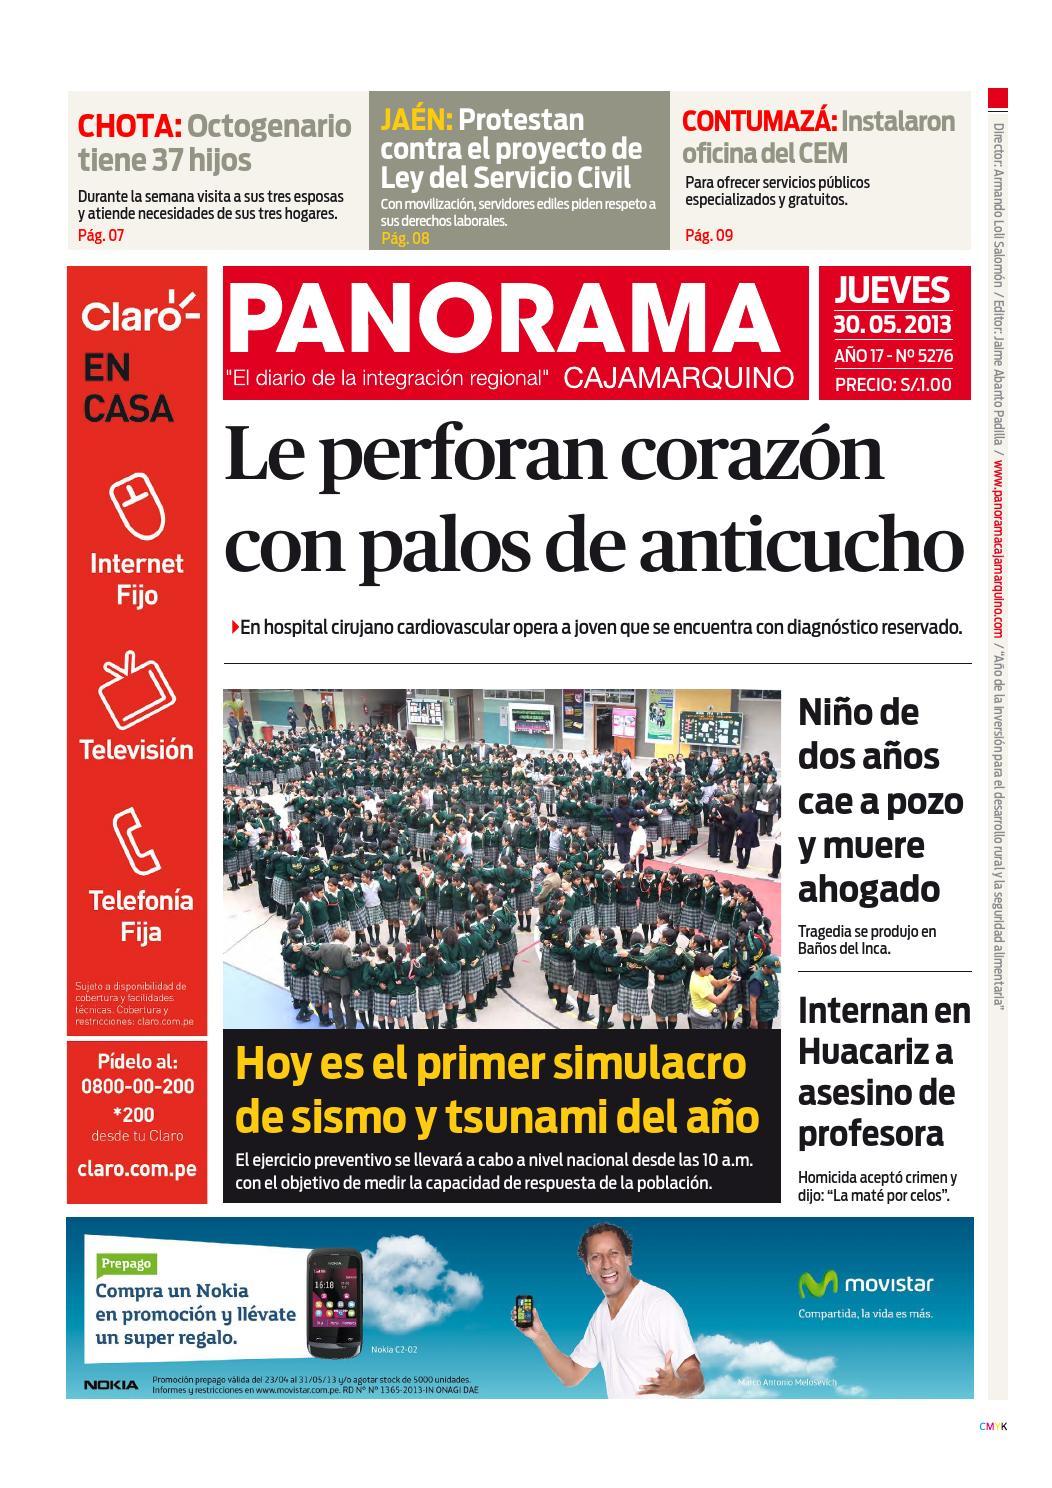 Diario 30 05 2013 by Panorama Cajamarquino - issuu